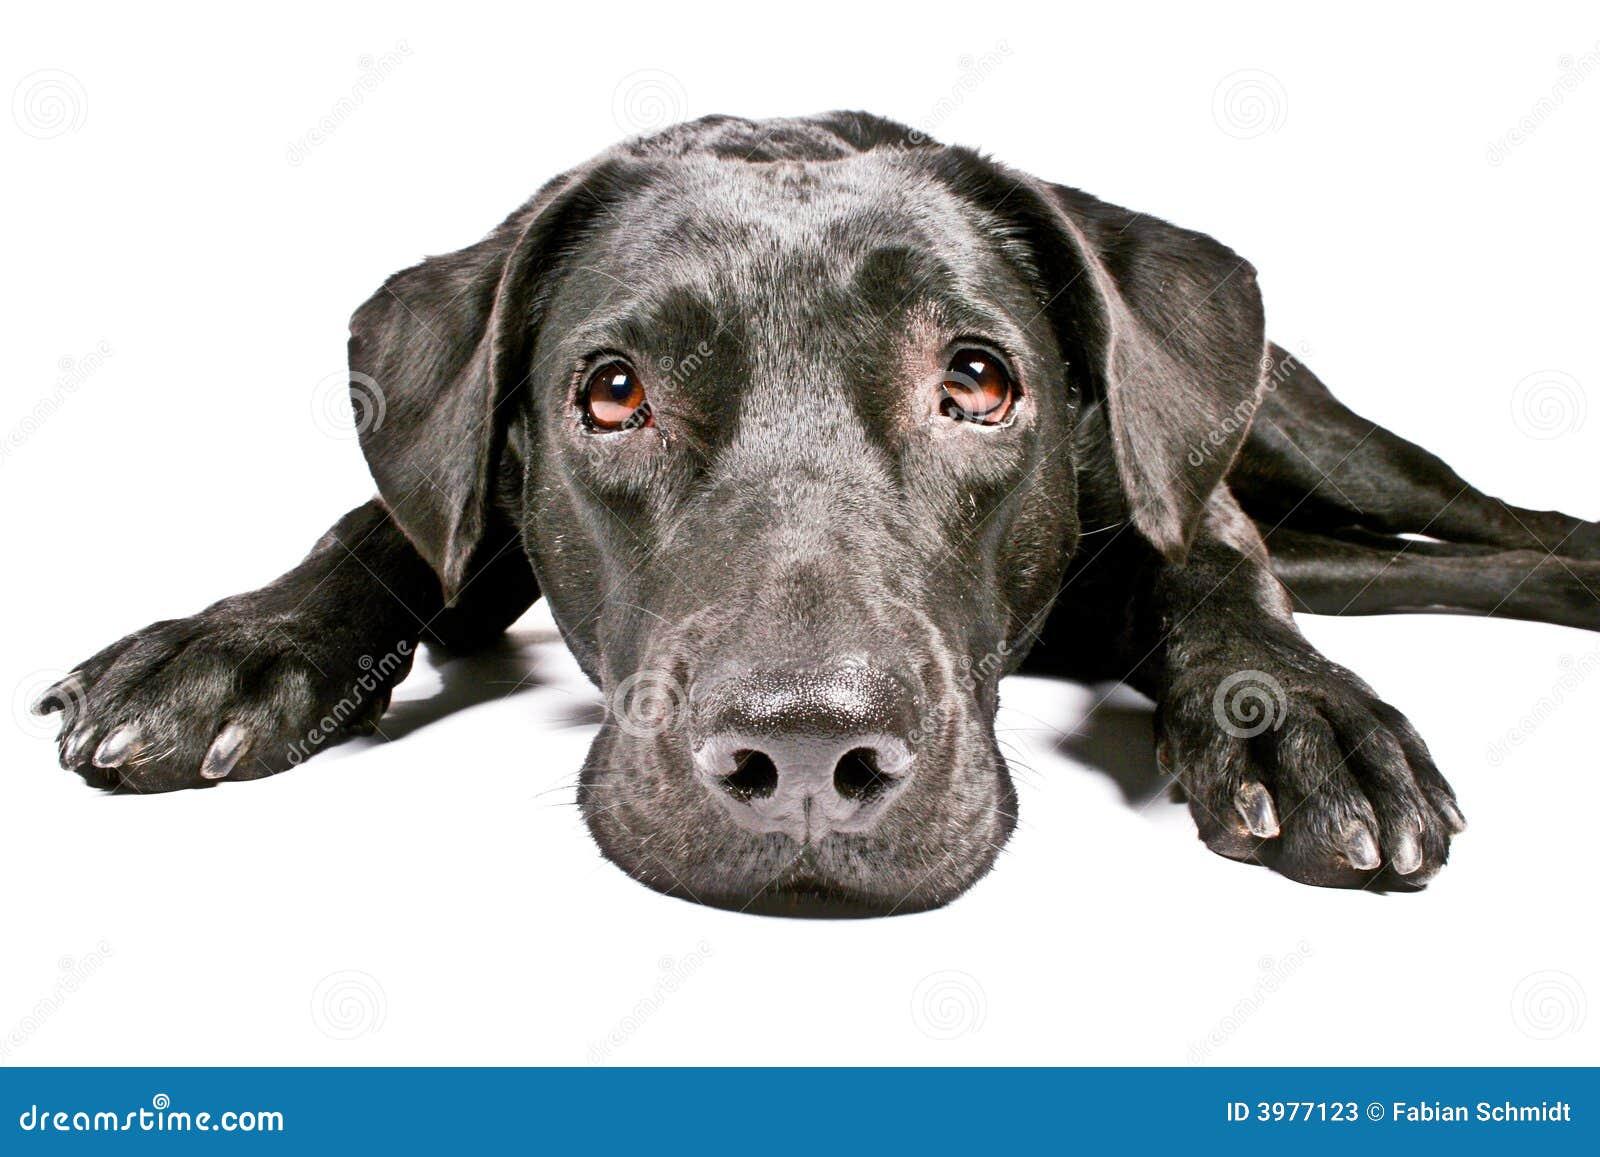 black dog looking sad iv stock photos - image: 3977123